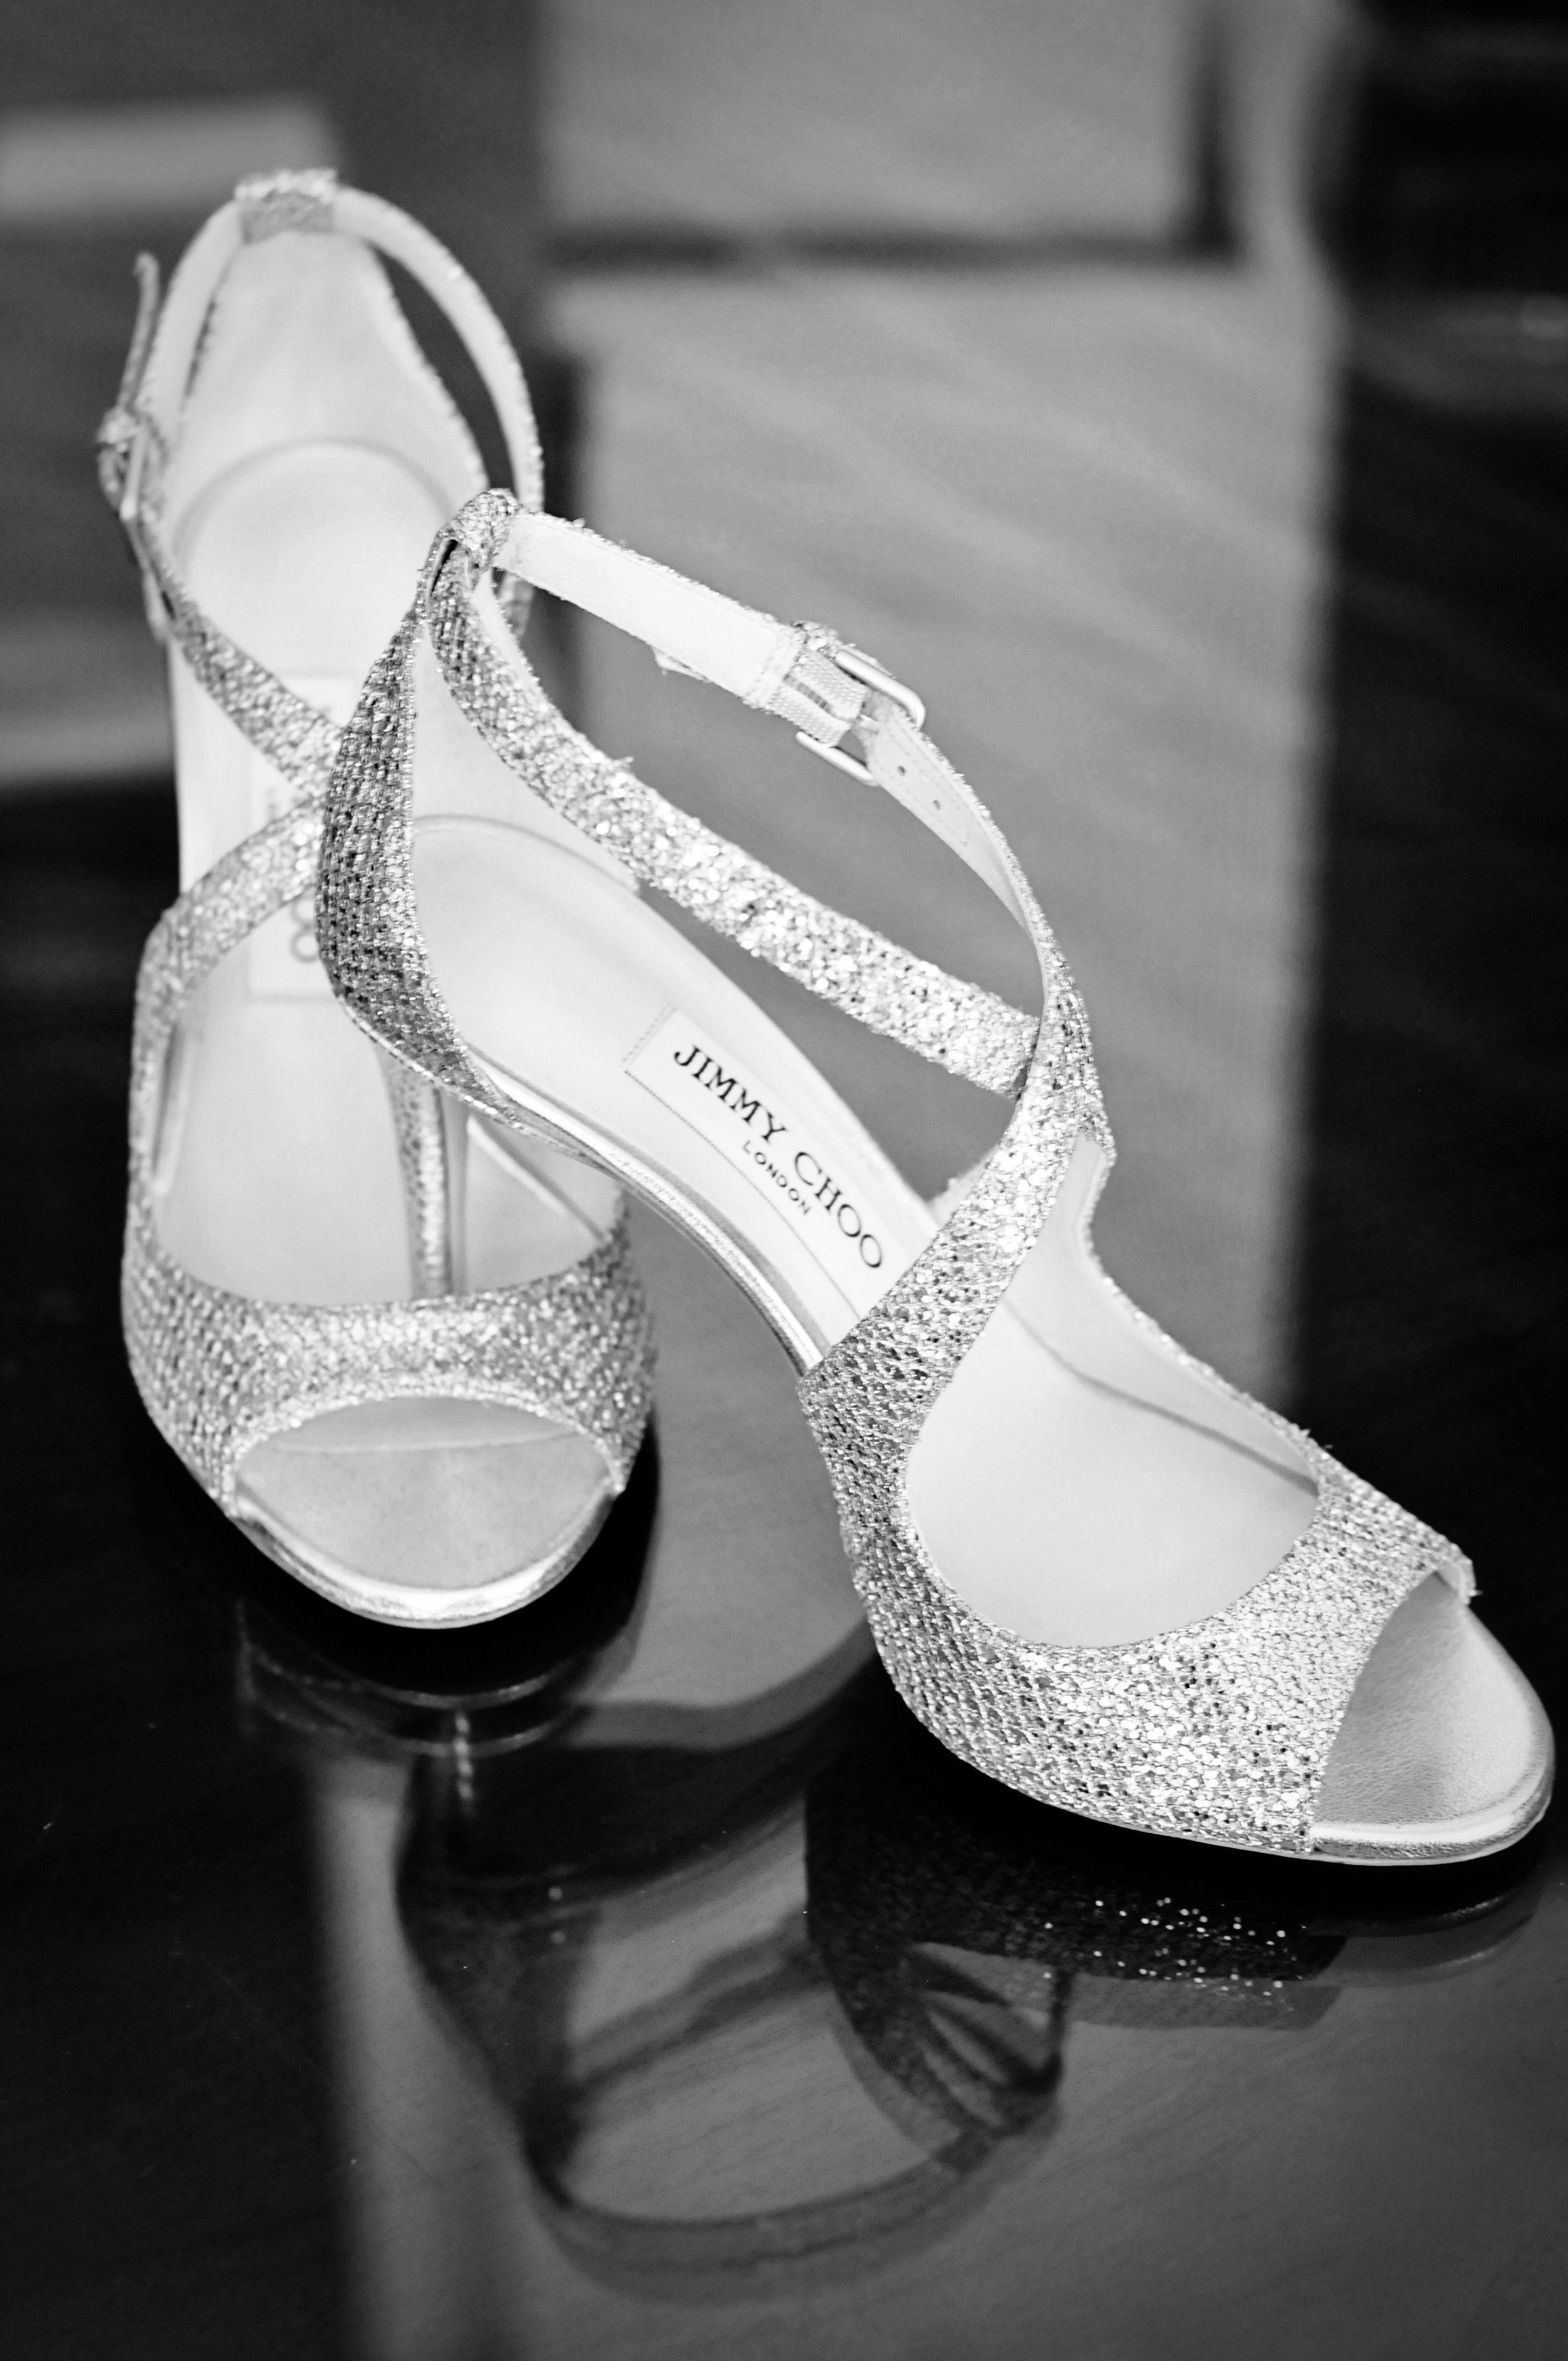 Partovi Wedding 2109bw by maria pablo.jpg